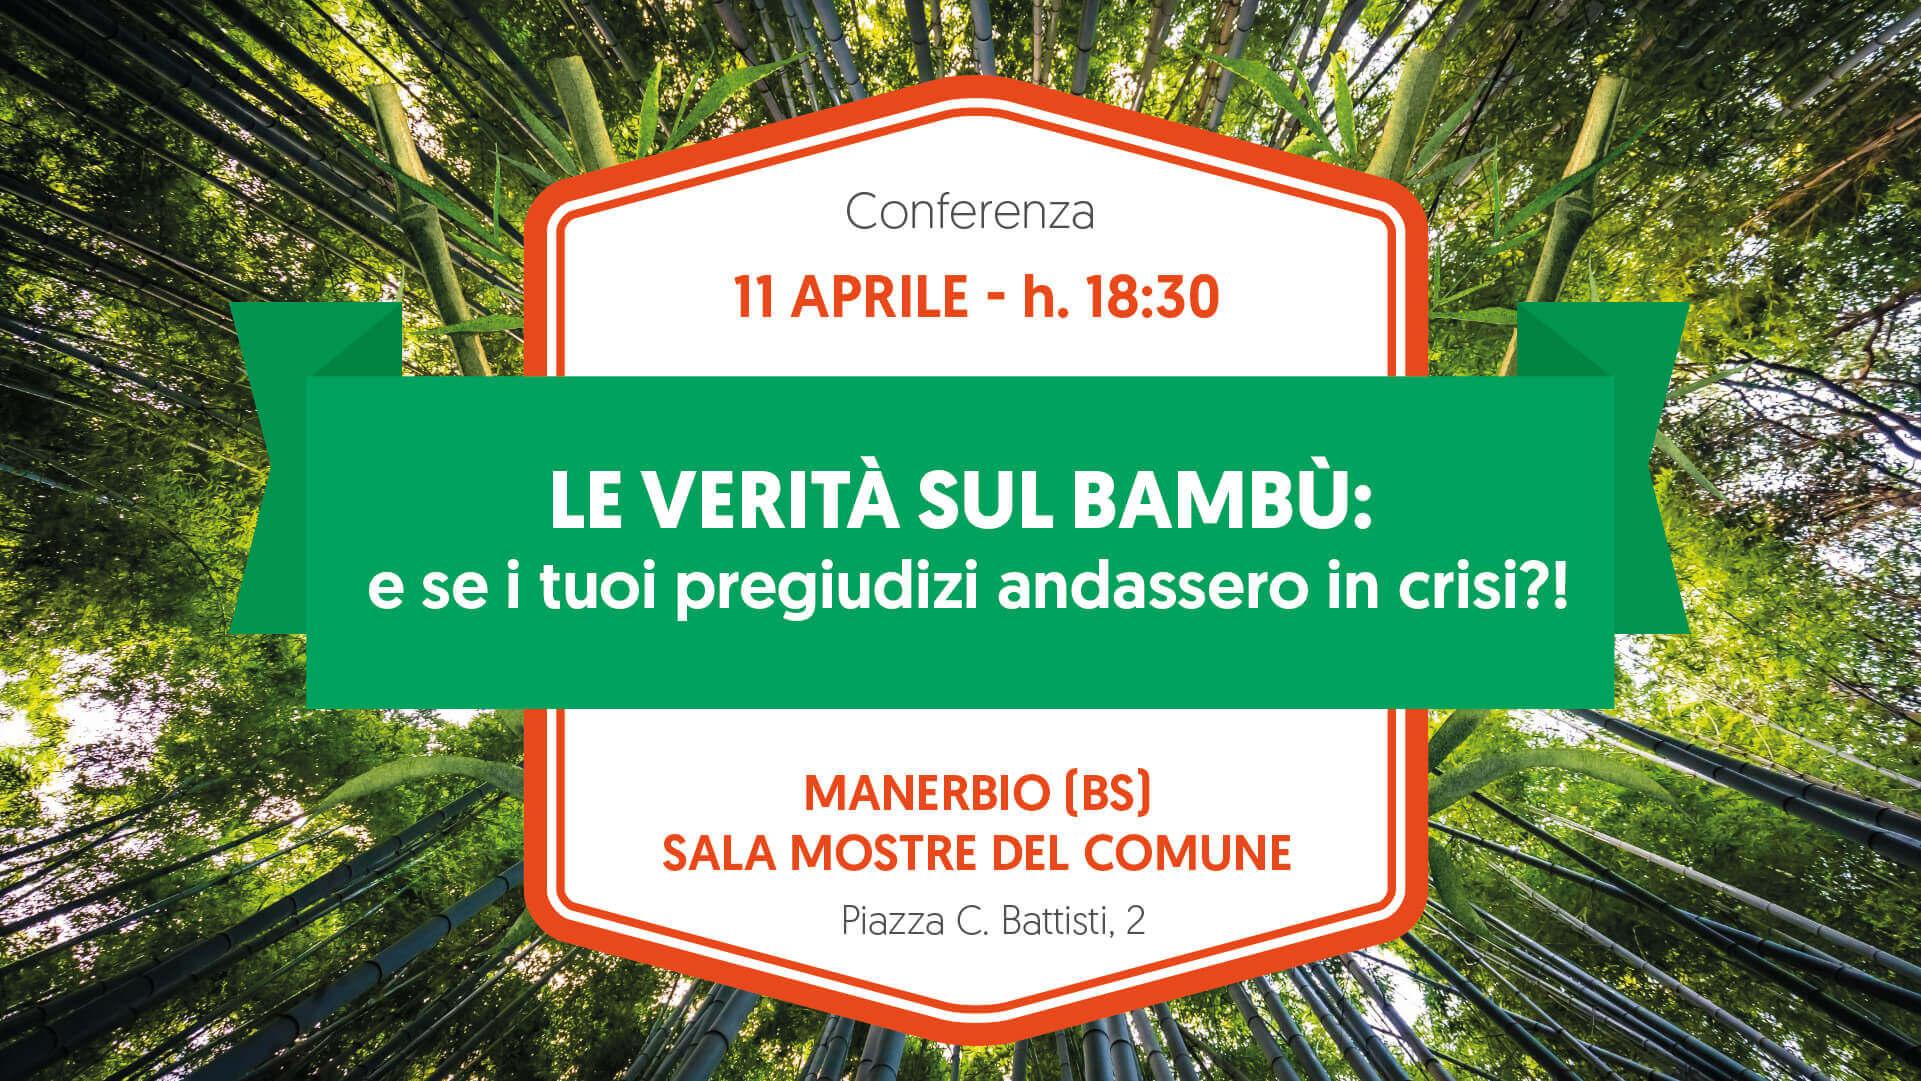 Conferenza 11 Aprile Verita Bambu